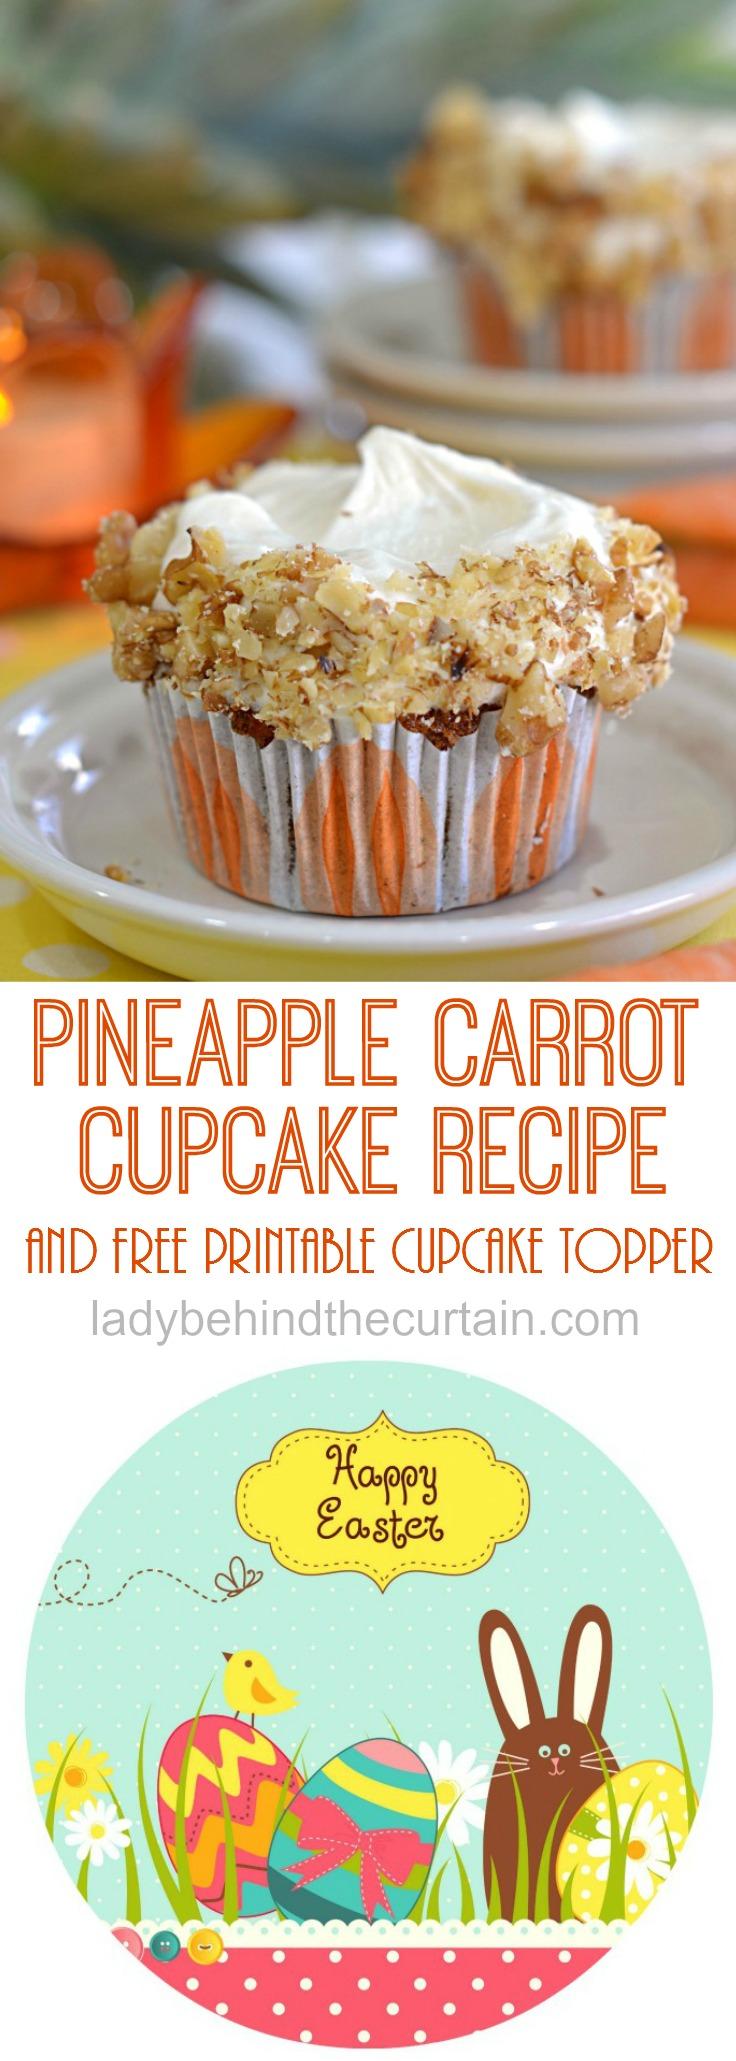 Pineapple Carrot Cupcakes | Easter Brunch Recipe, Carrot Cake Recipe, Easy Recipe, Cupcakes